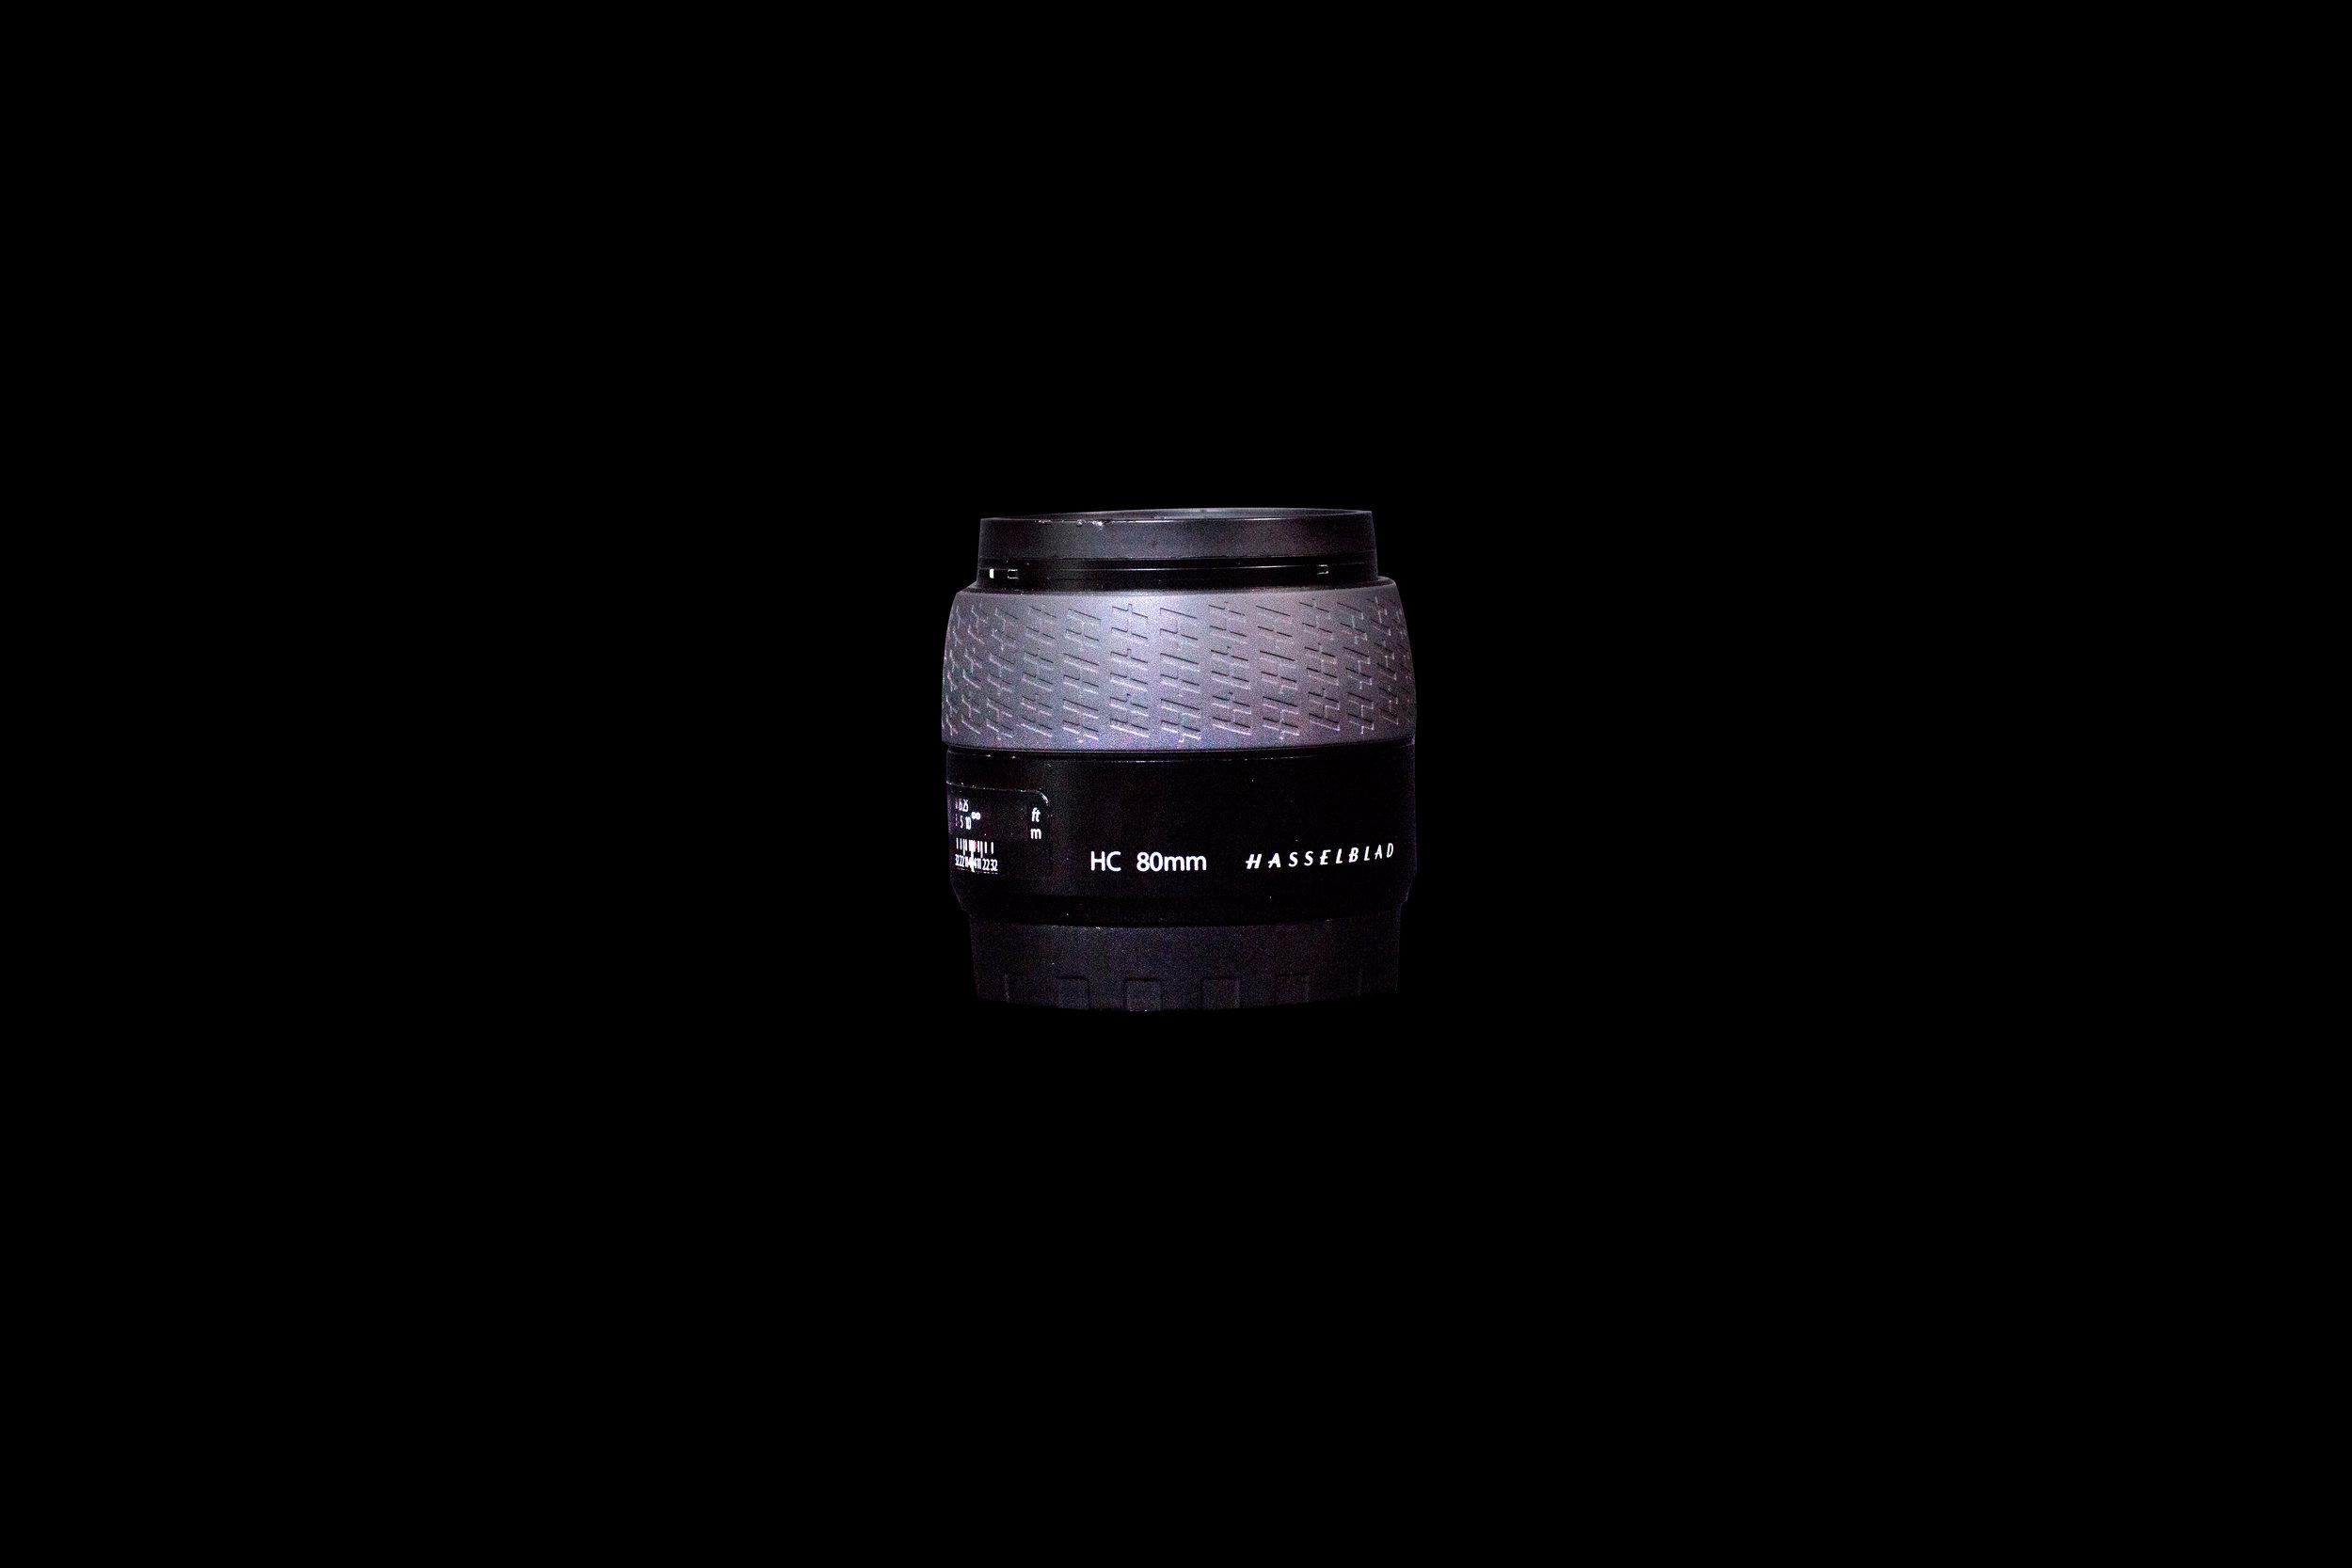 Hasselblad 80mm f/2.8